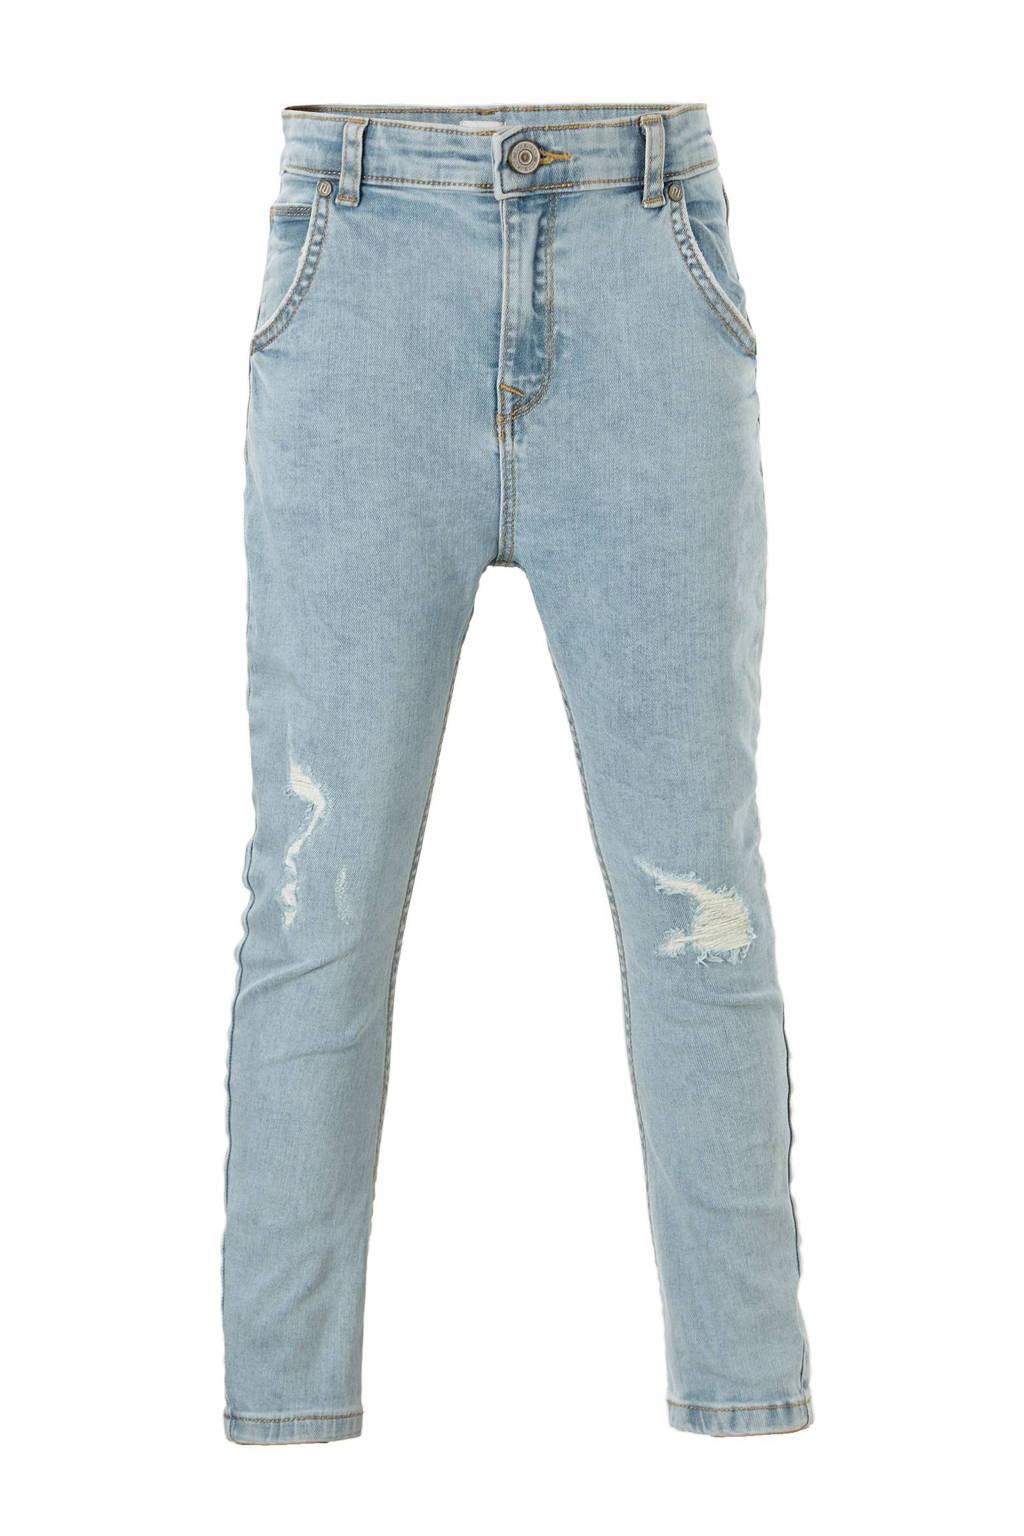 River Island jeans met slijtage details Tony, Lichtblauw